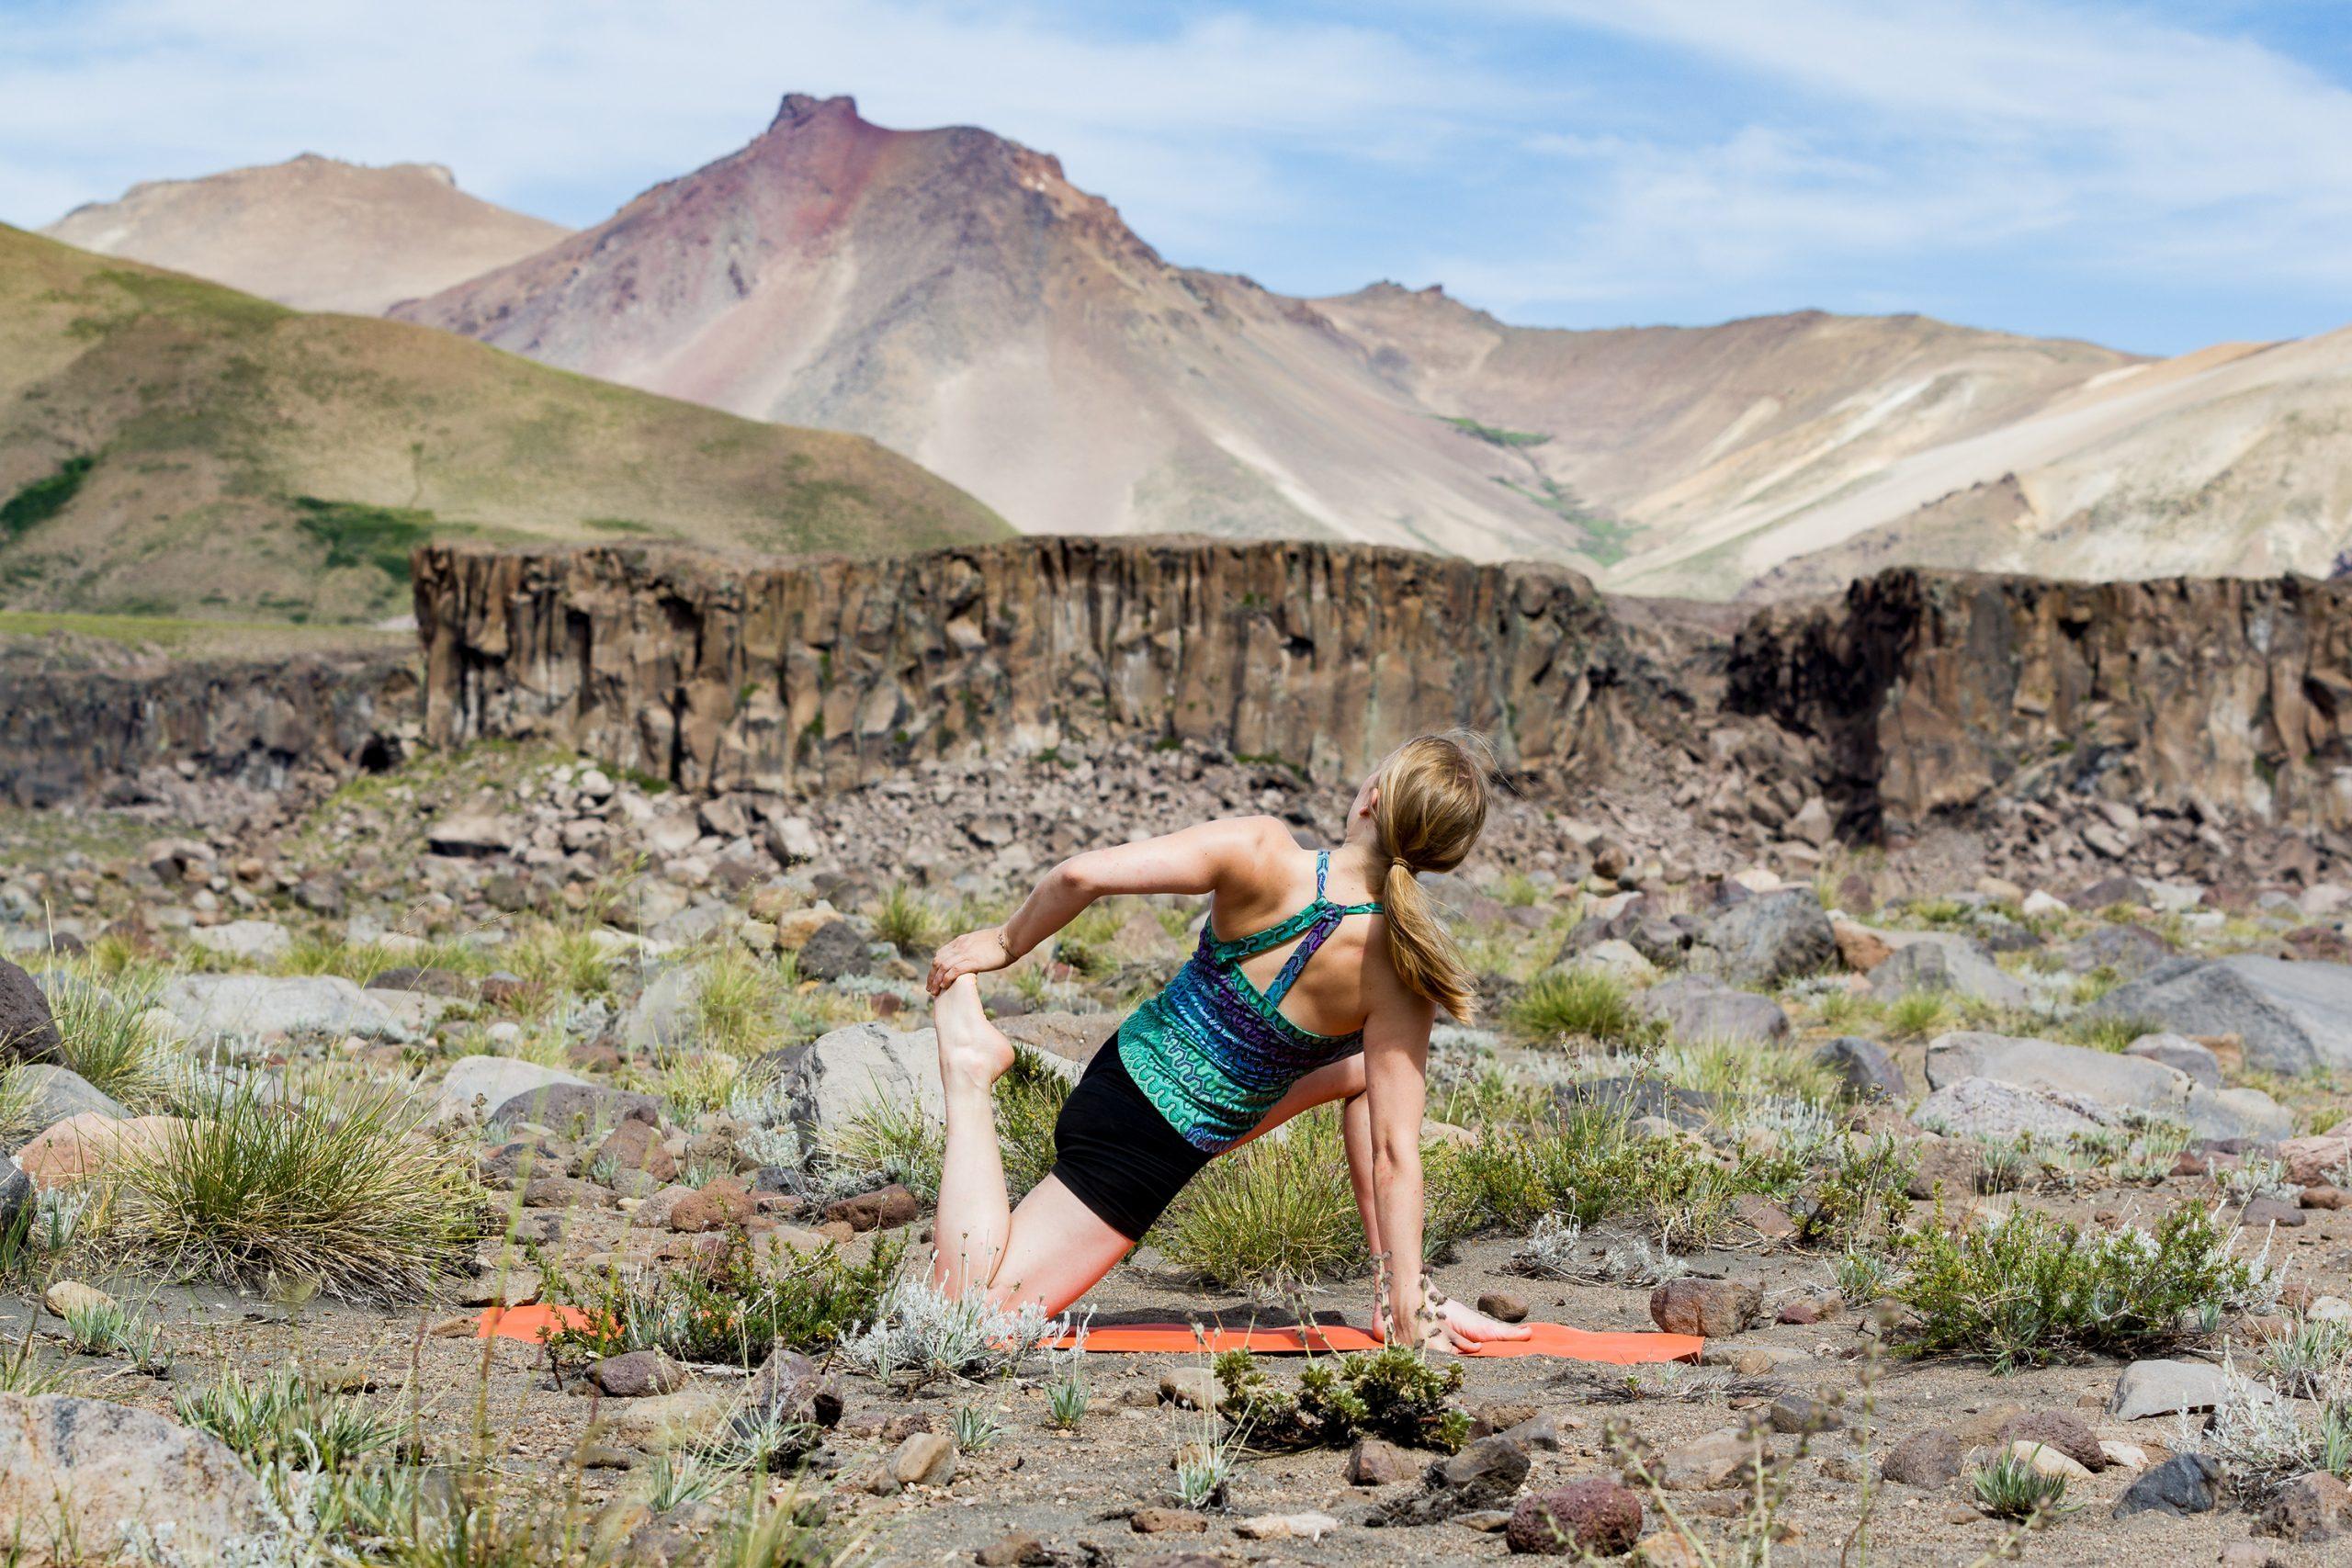 Yoga-Position-Valle-de-los-Condores-Climbing-Chile